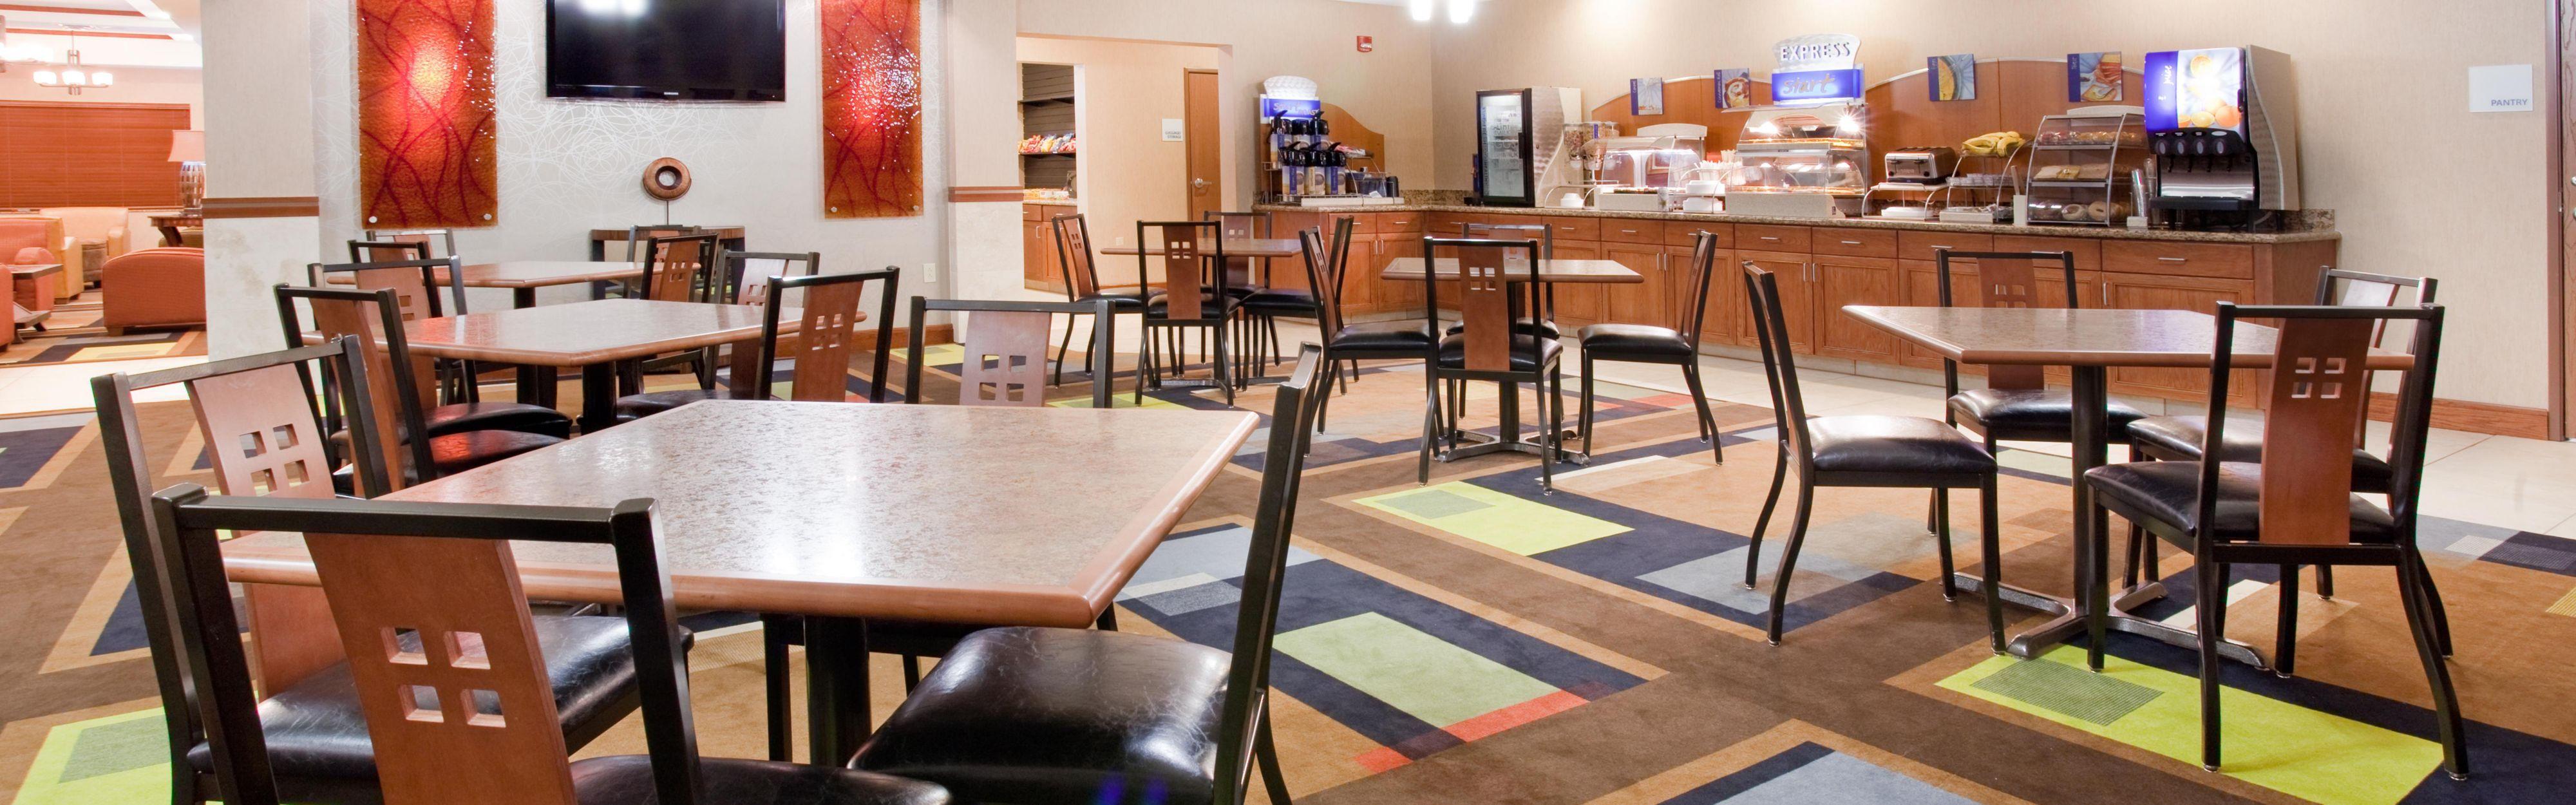 Holiday Inn Express & Suites Los Alamos Entrada Park image 3